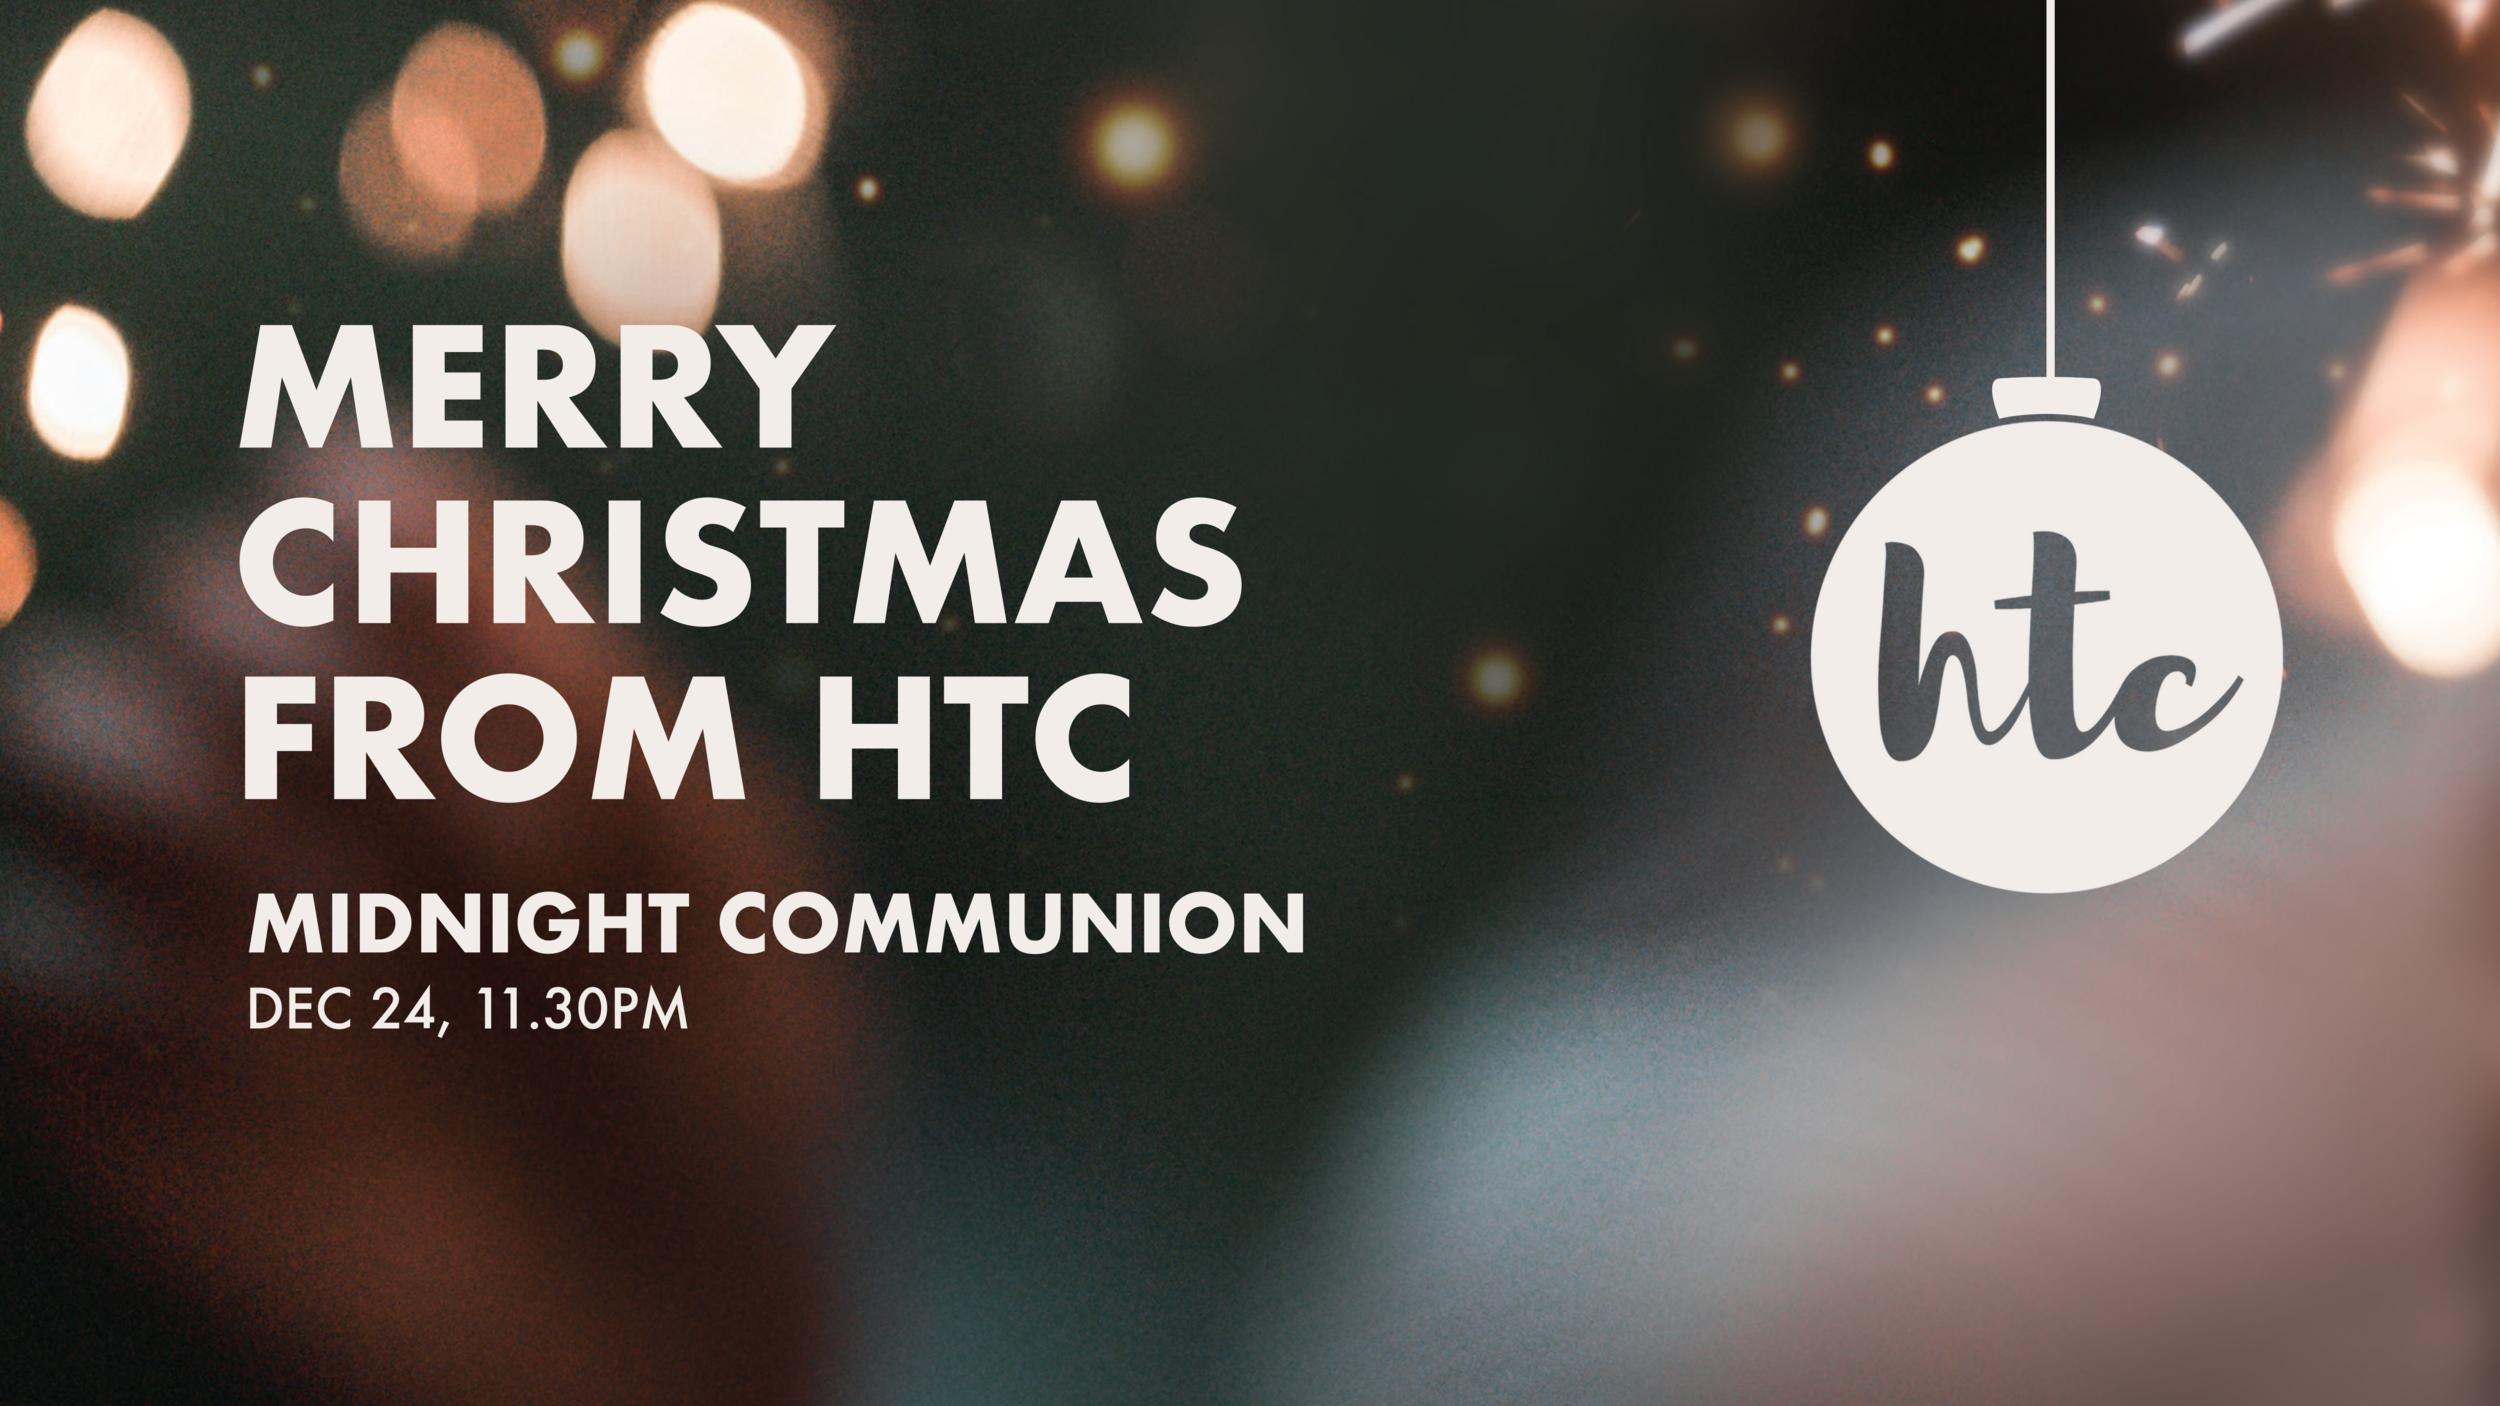 midnight - 181028_HTC_Christmas-Screens-16-9_V03.0-8.png